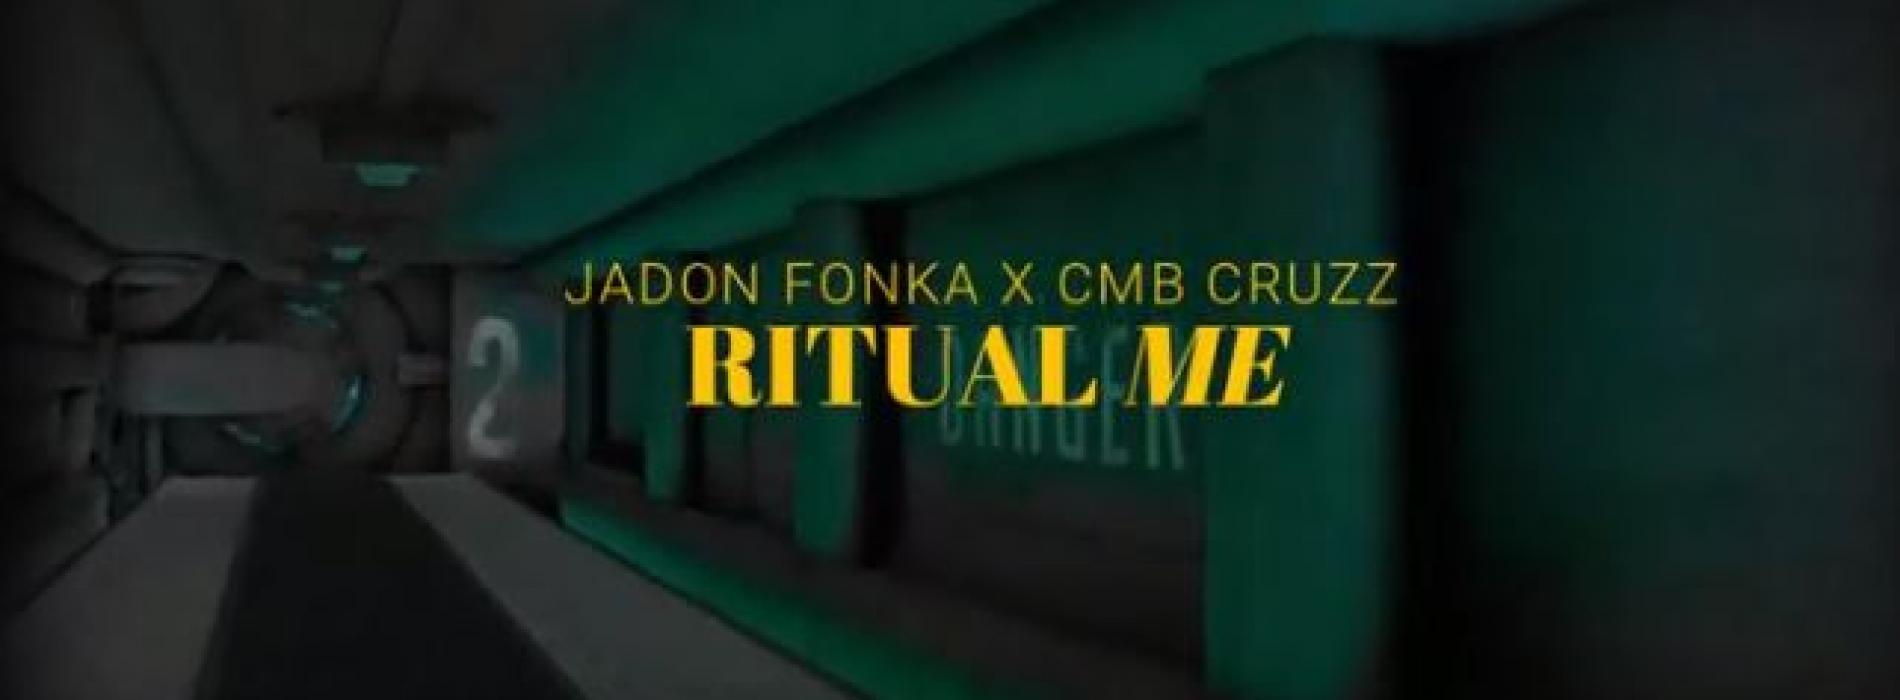 New Music : Jadon Fonka & Cmb Cruzz – Ritual Me (Spaceman Visual Edit)